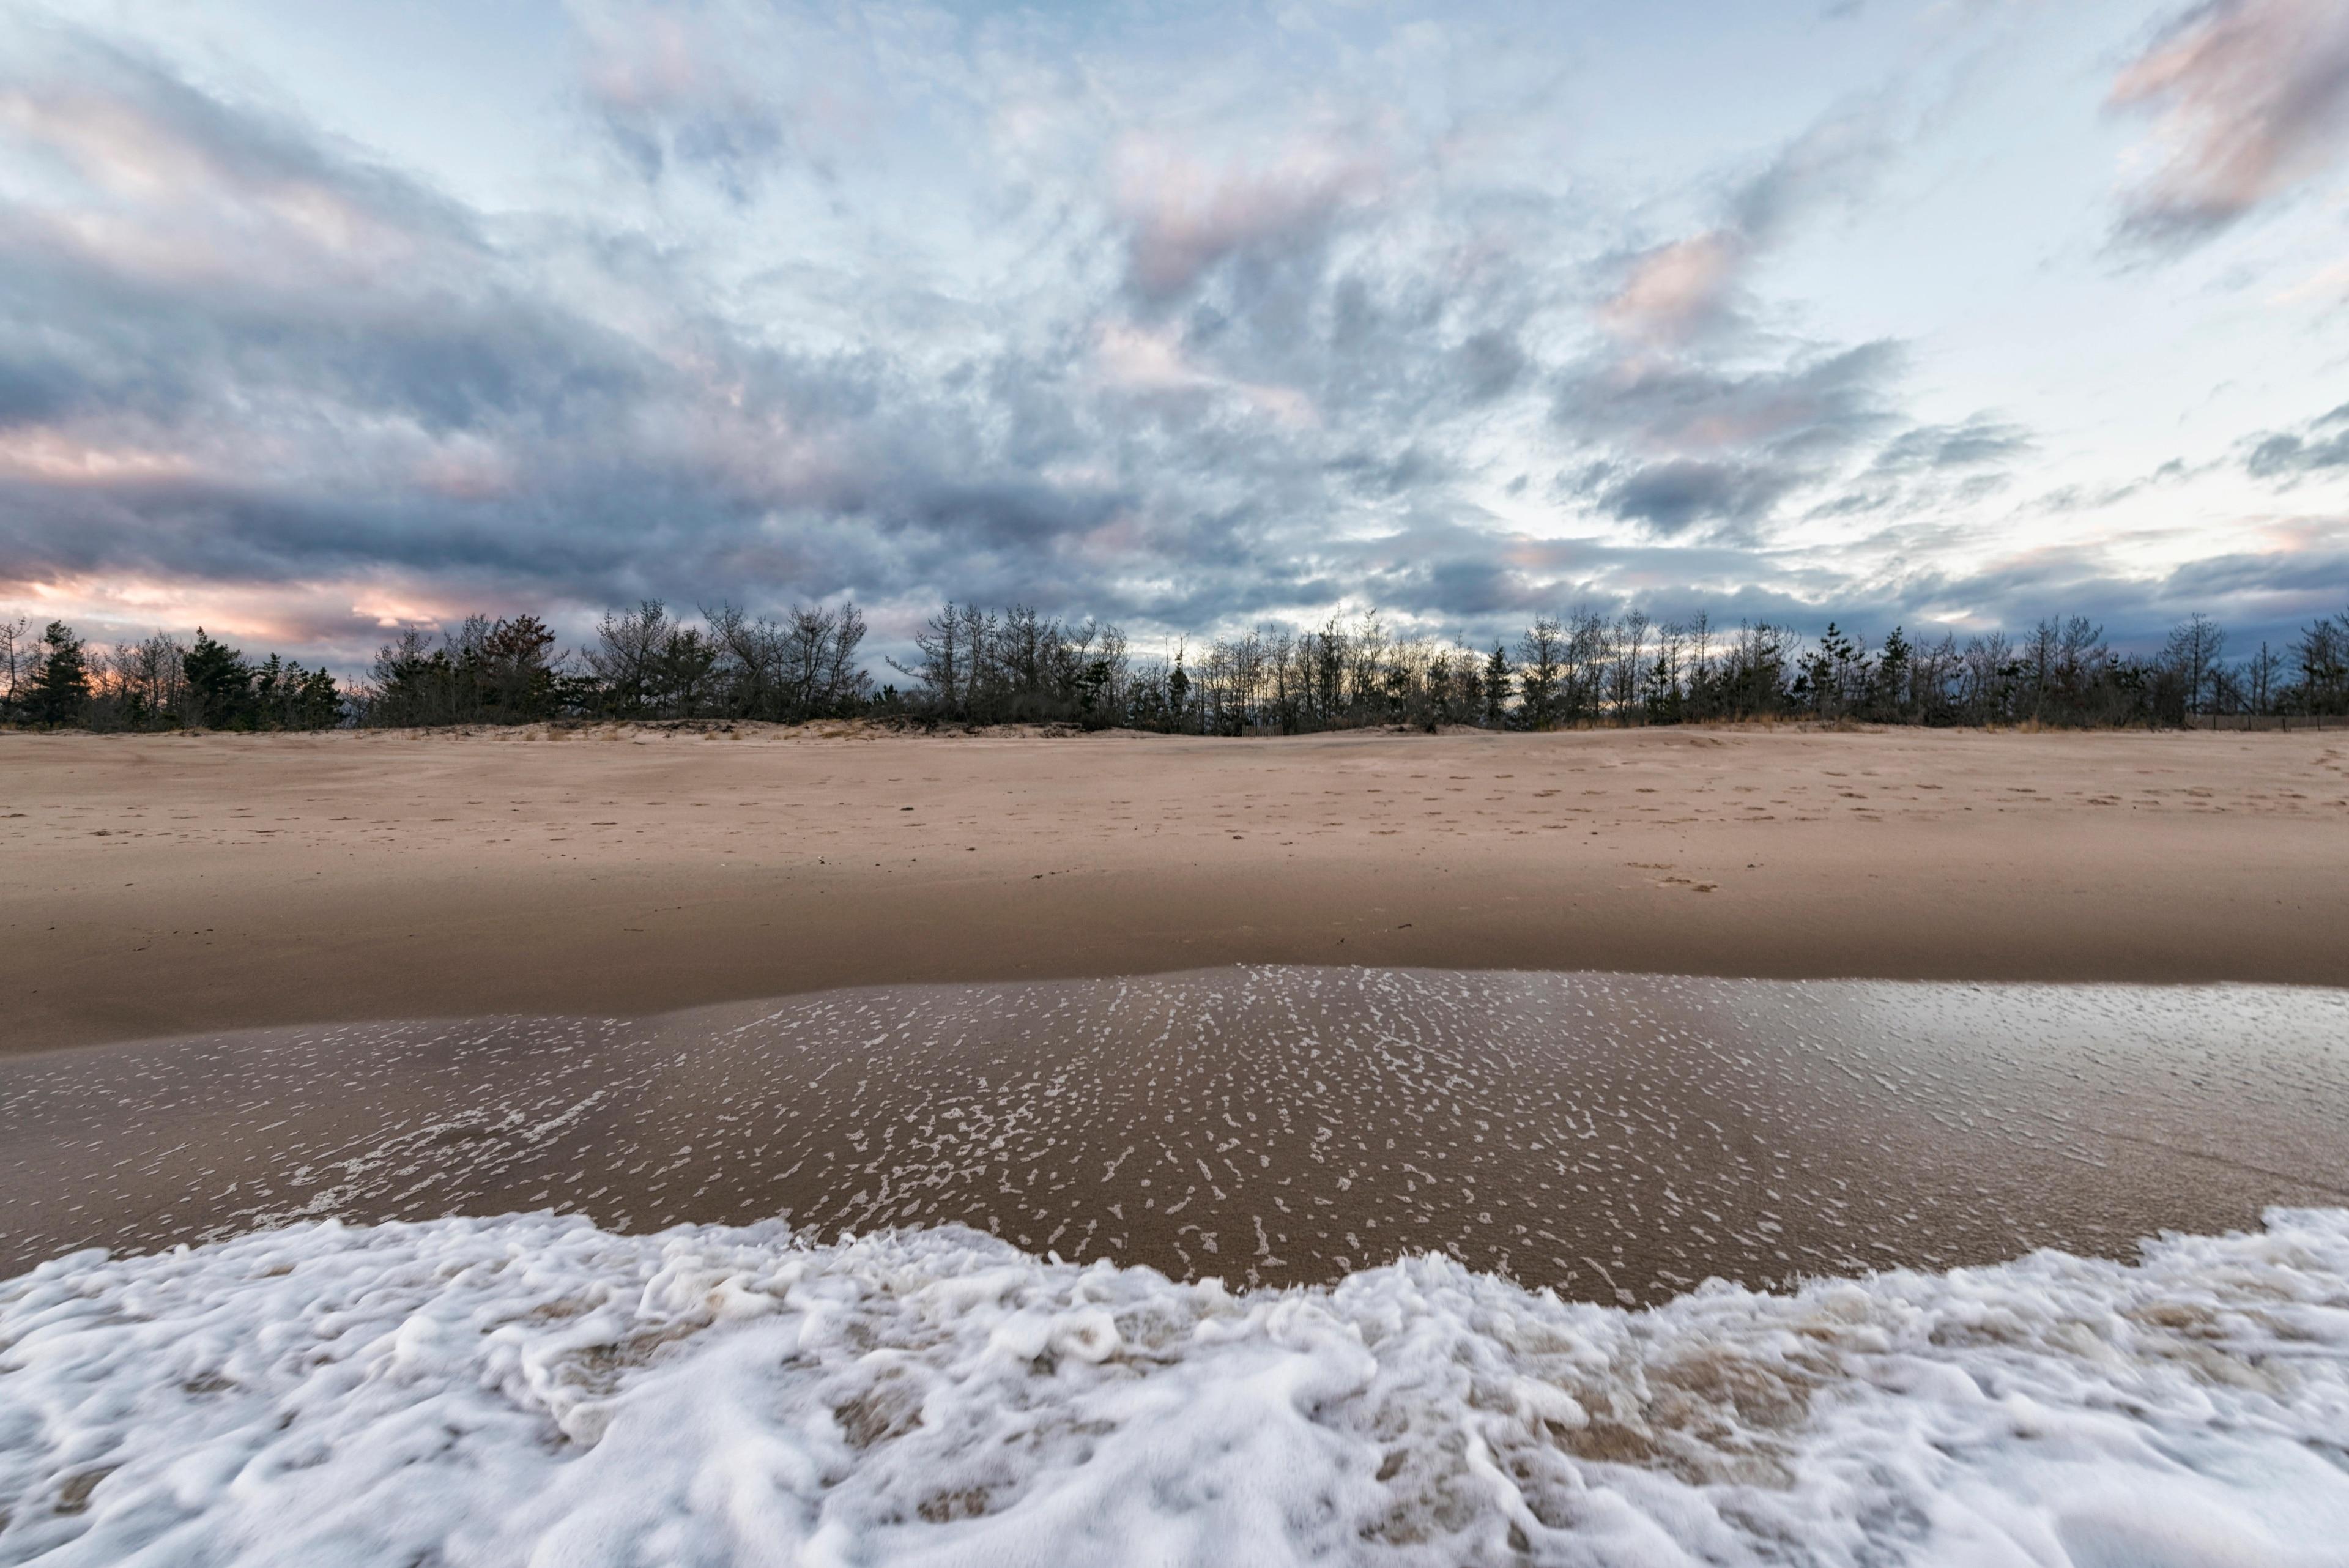 Charlestown, Rhode Island, United States of America